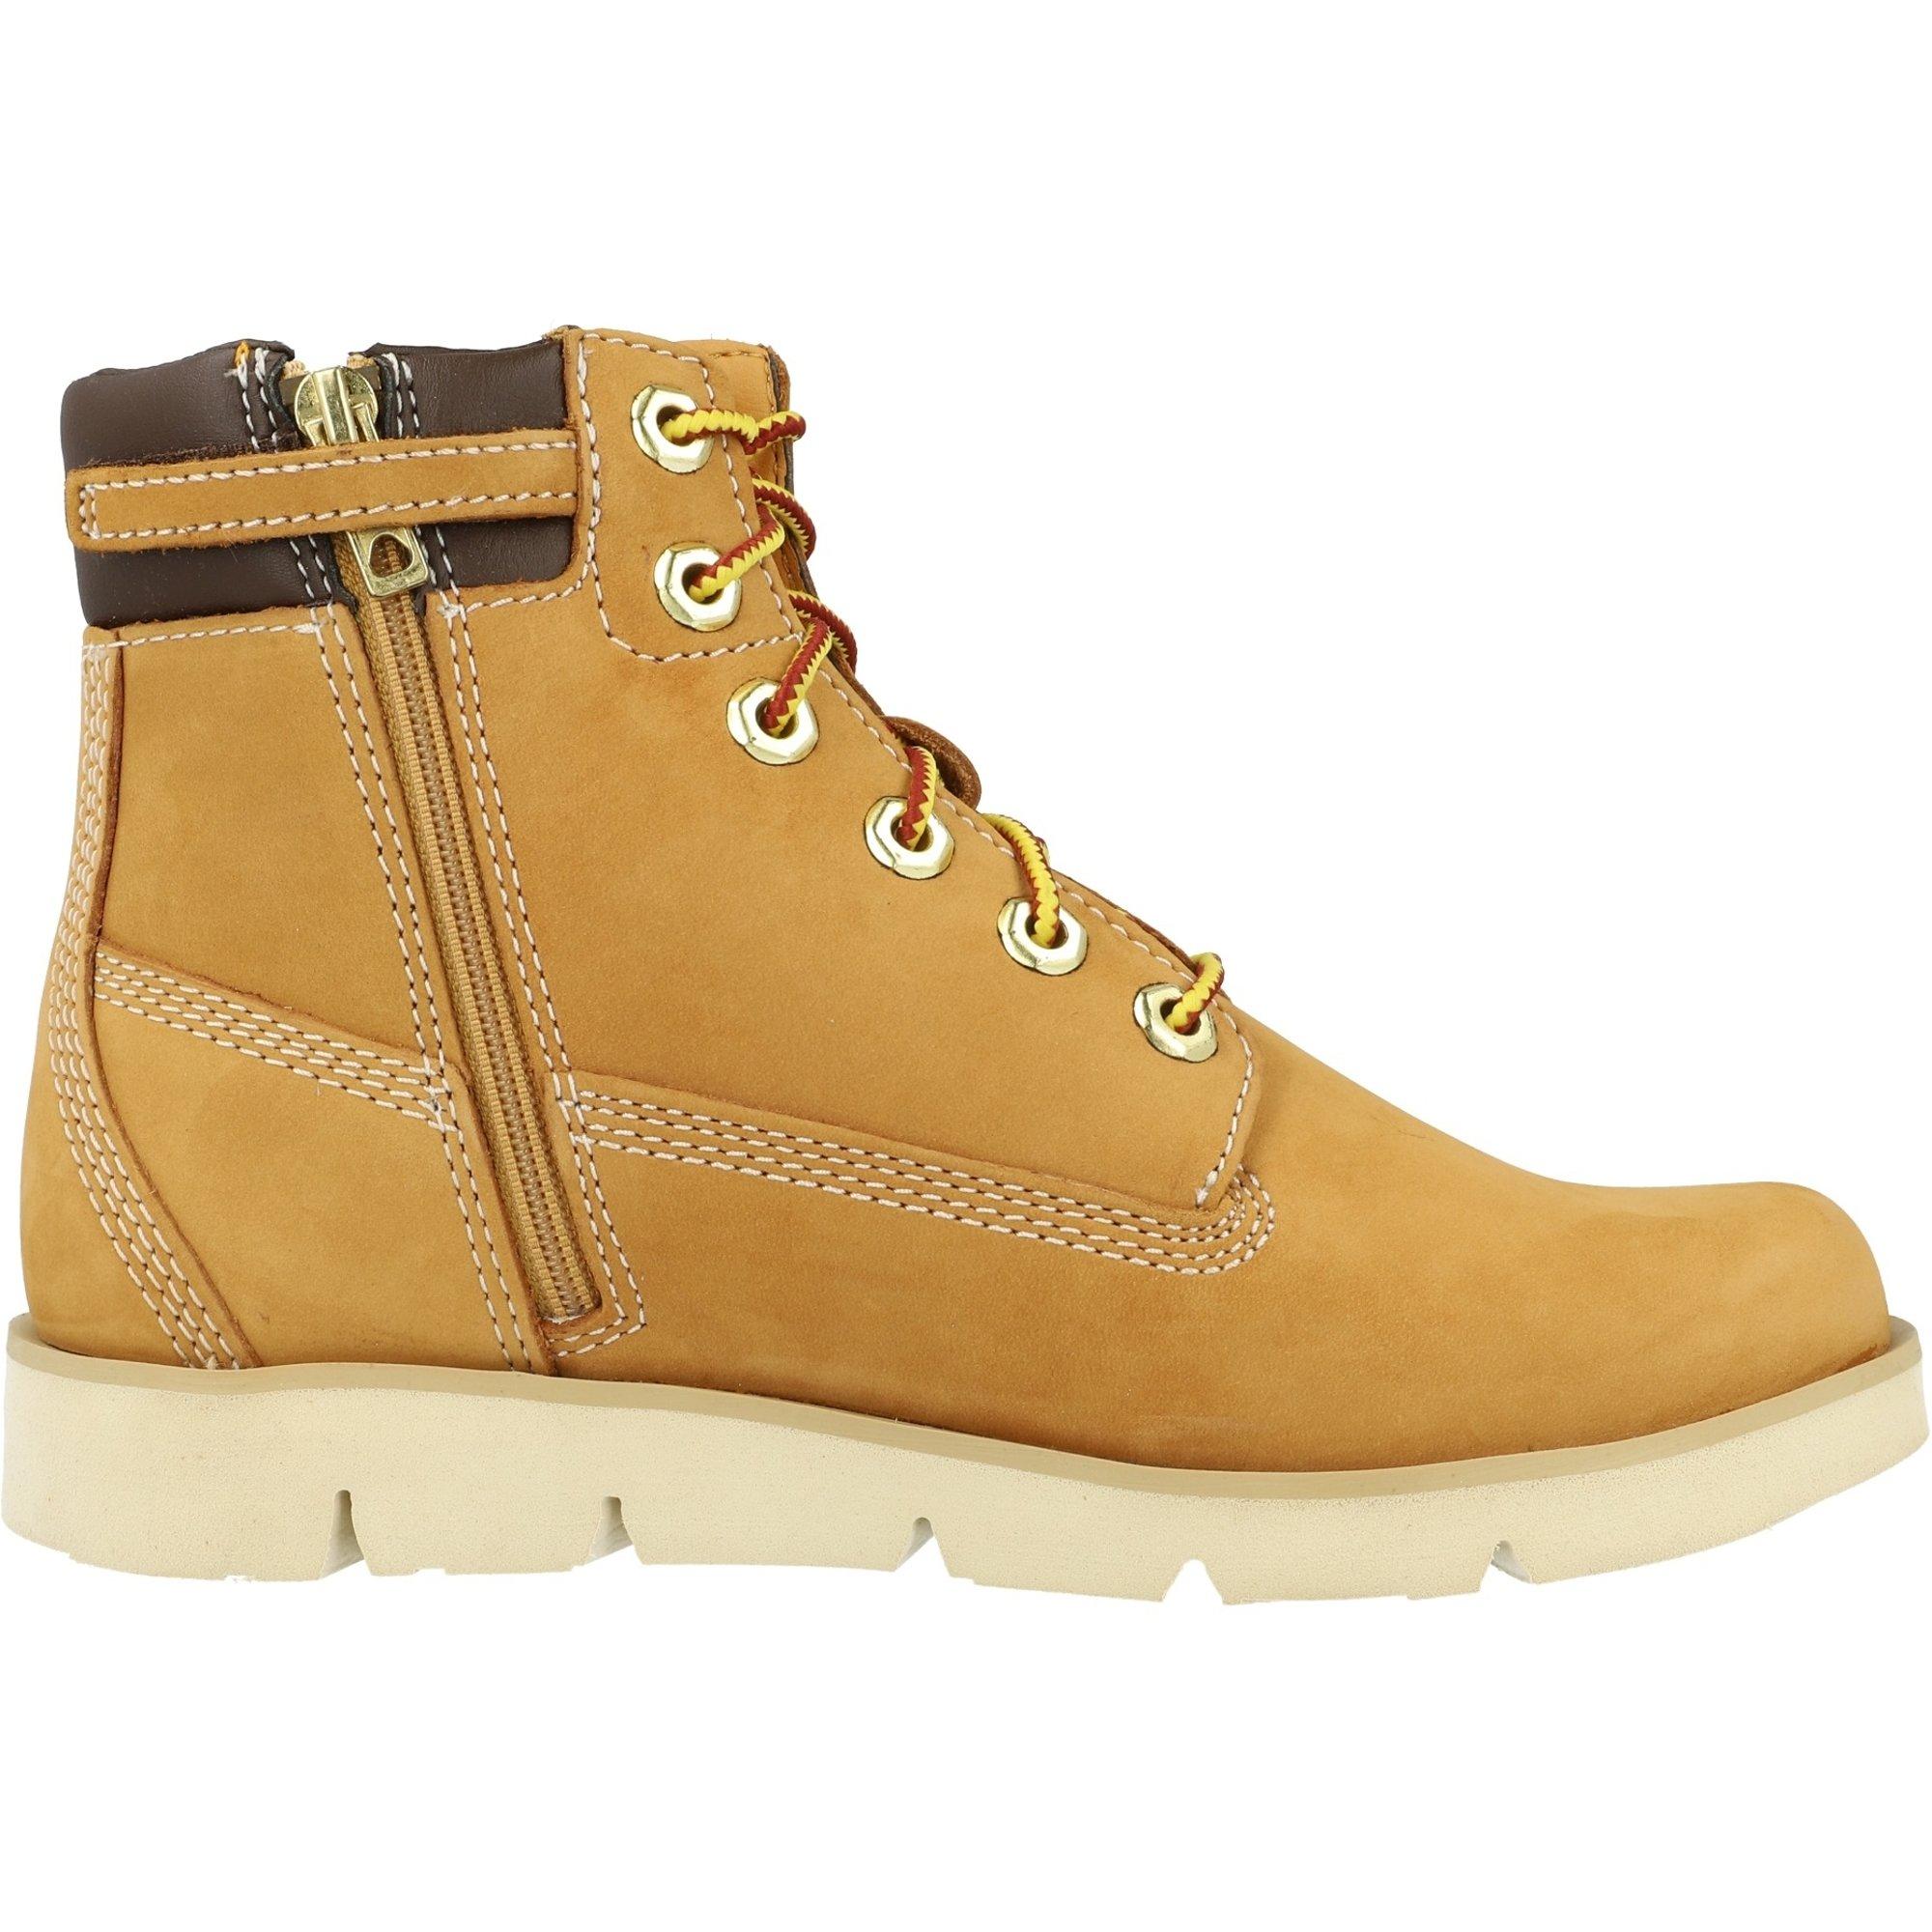 Timberland Radford 6 Inch Boot Weizen Leder Jugend